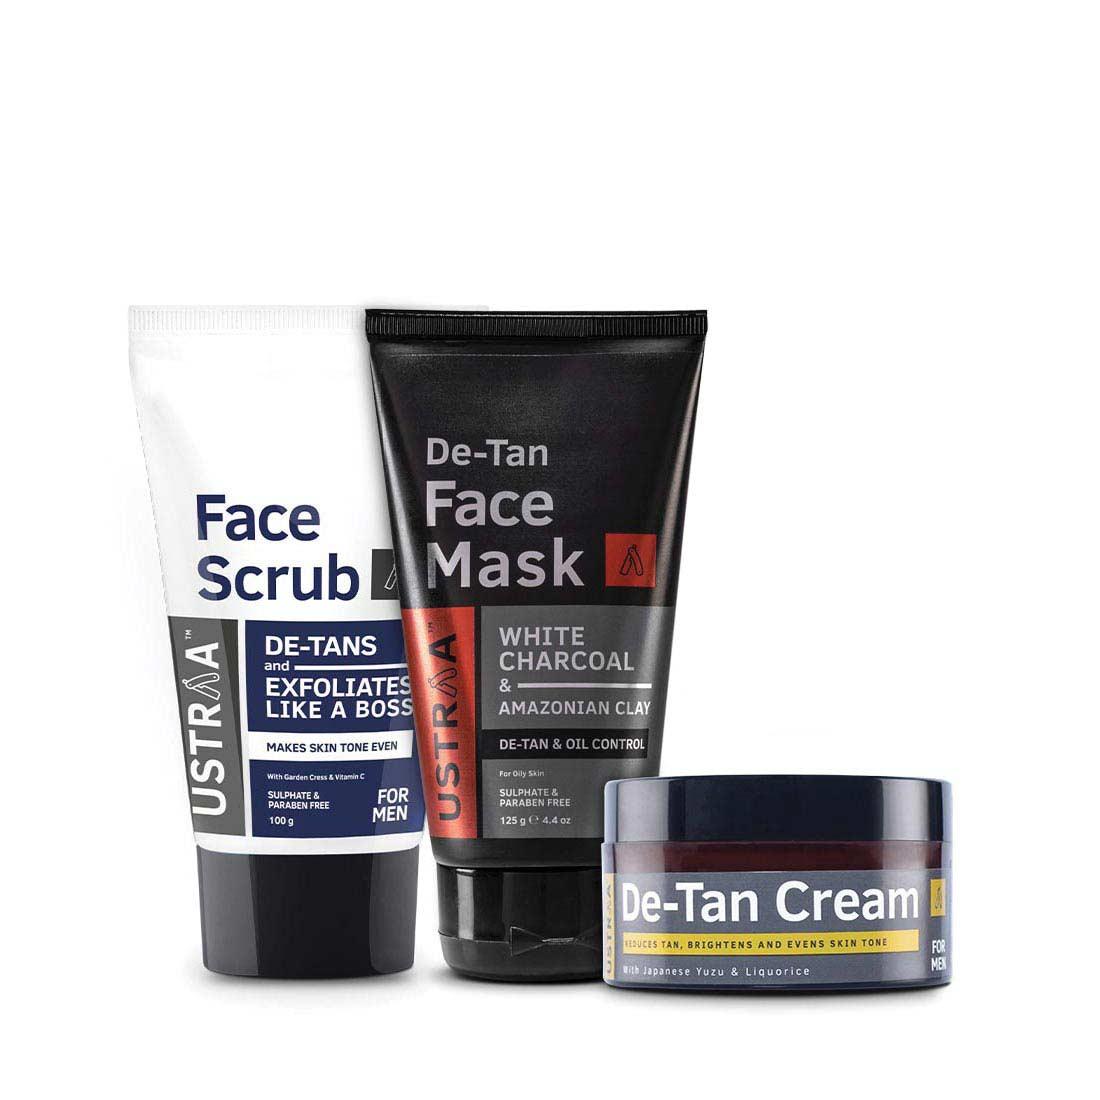 Ustraa Complete De-Tan Kit for Men (Pack of 3): Face Scrub, Face Mask, and De-tan Cream